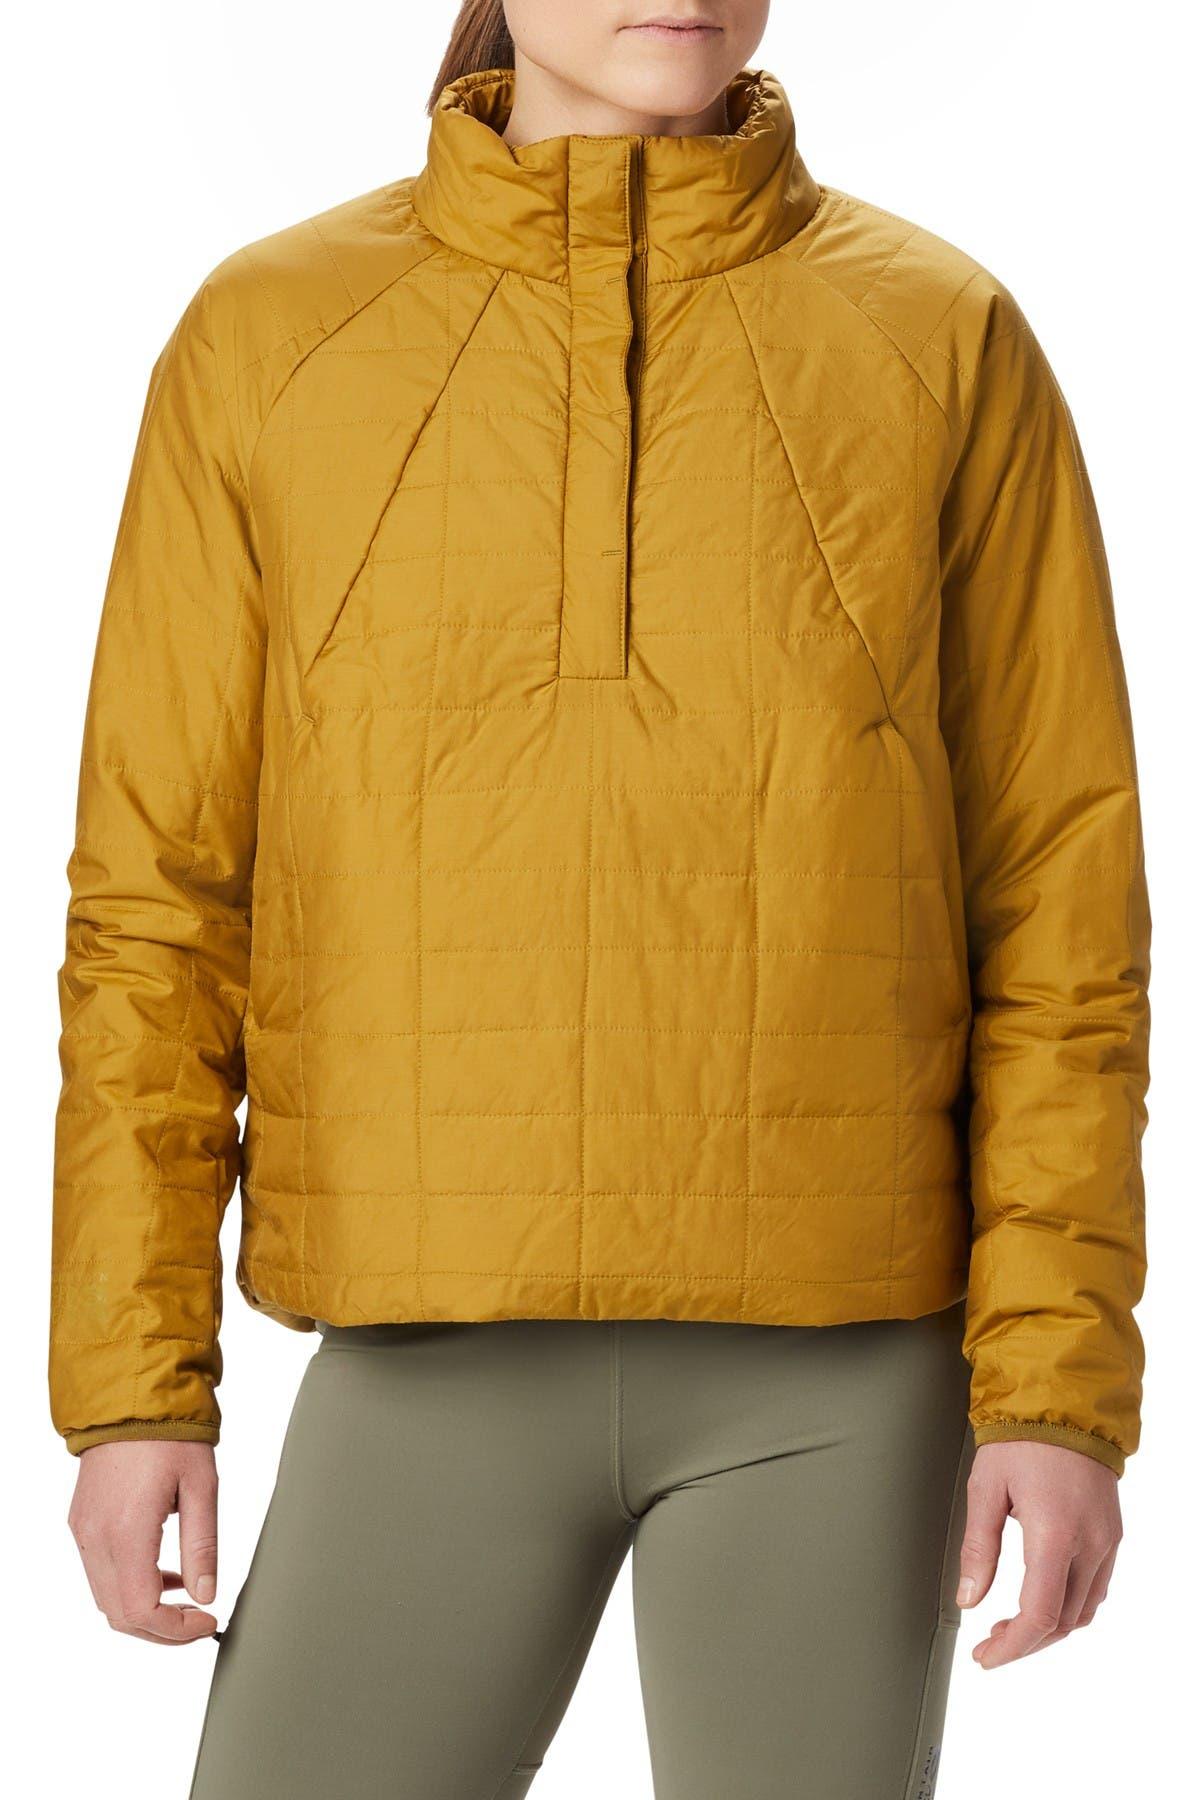 Image of MOUNTAIN HARDWEAR Skylab™ Insulated Pullover